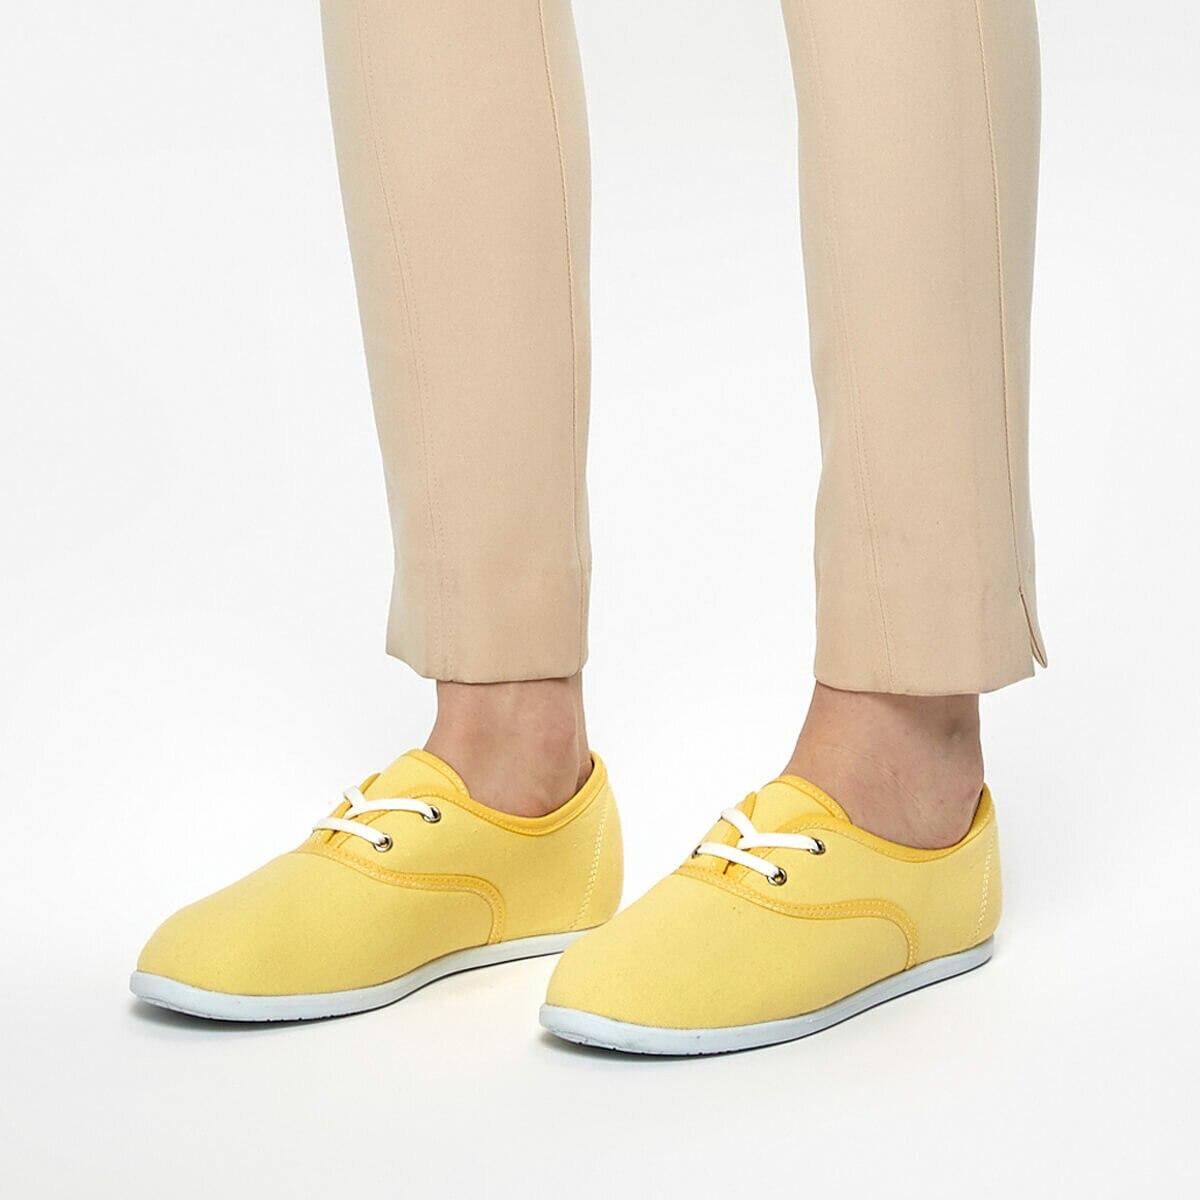 FLO CS19003 Yellow Women 'S Sneaker Shoes Art Bella